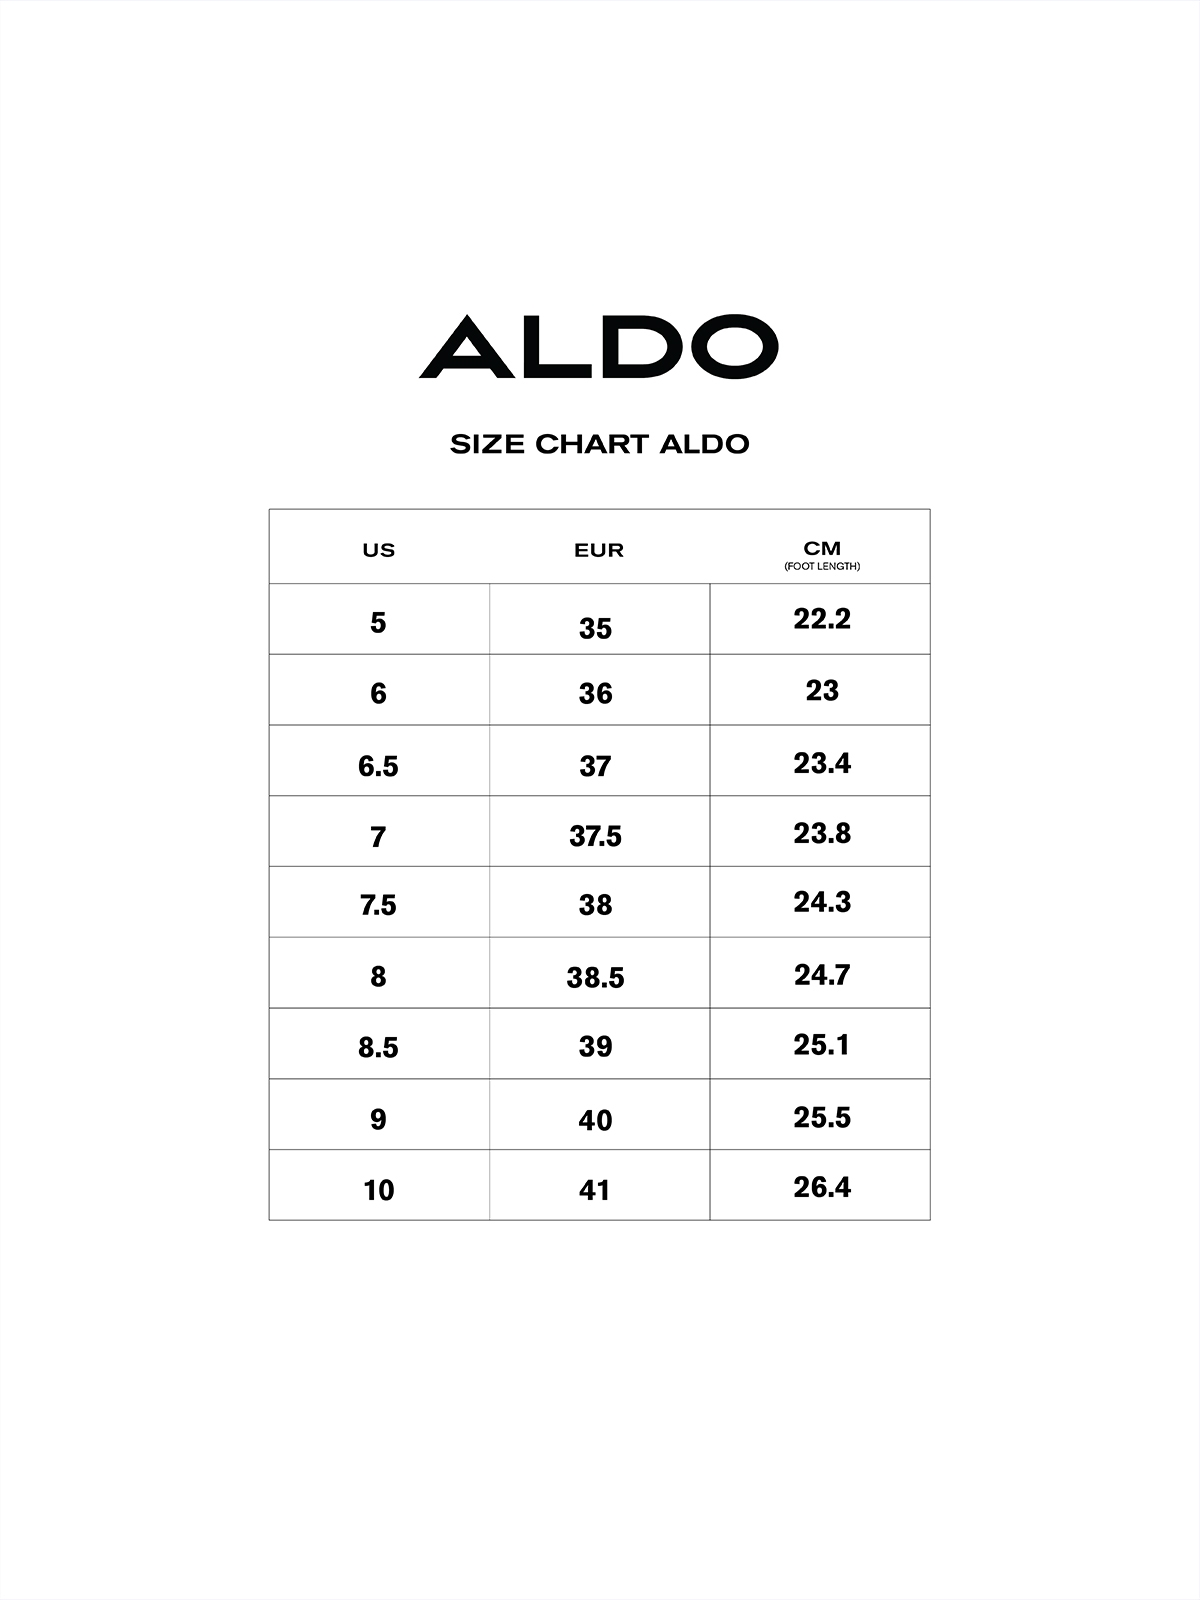 Aldo Dazzie Jet Sneakers BlackWhite